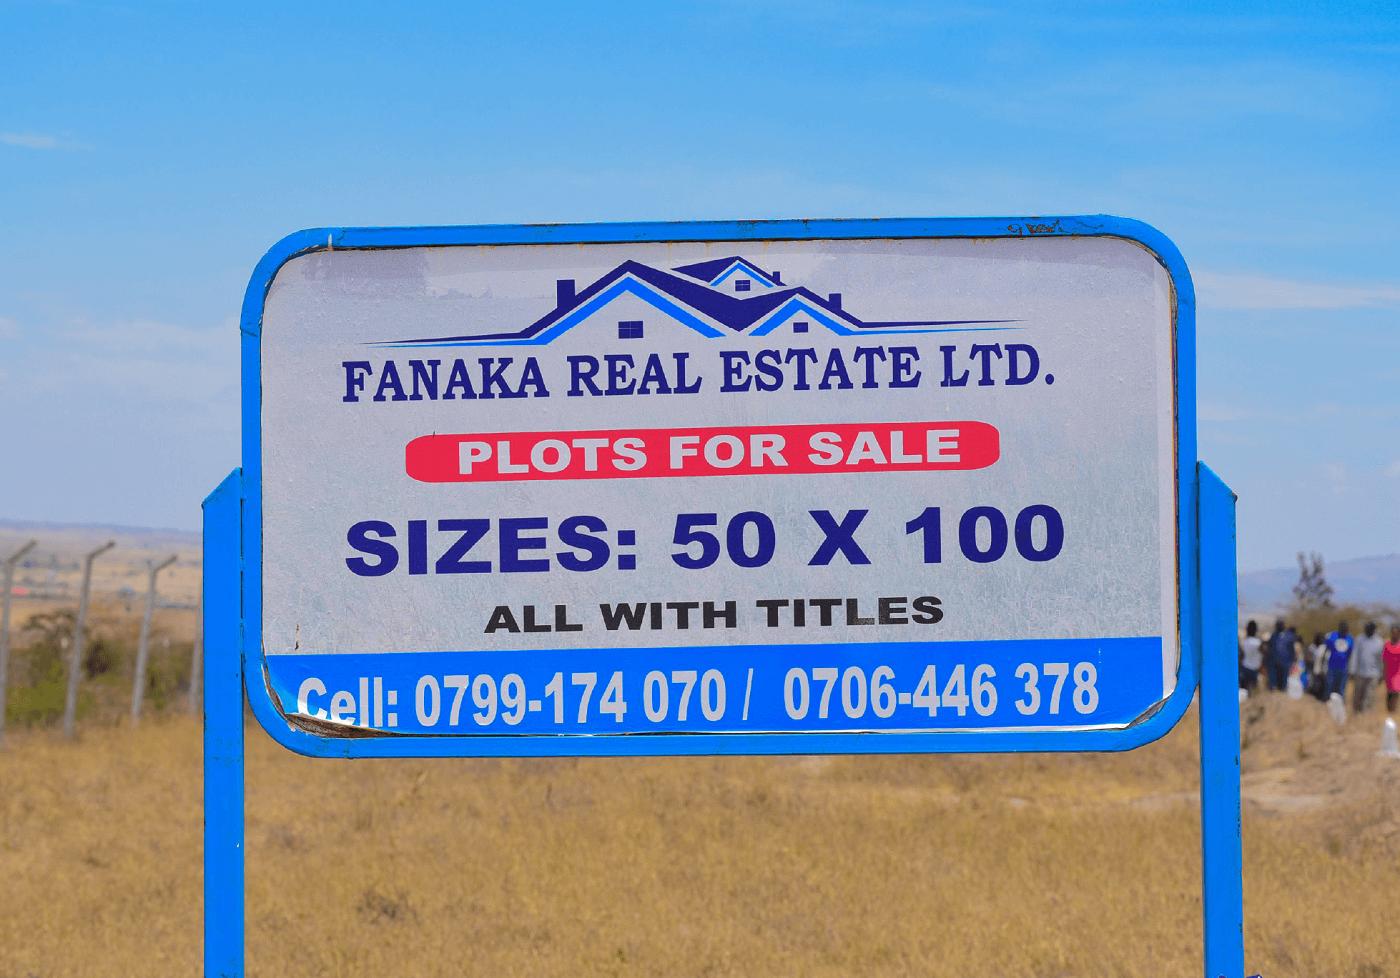 fanaka real estate company www.businesstoday.co.ke